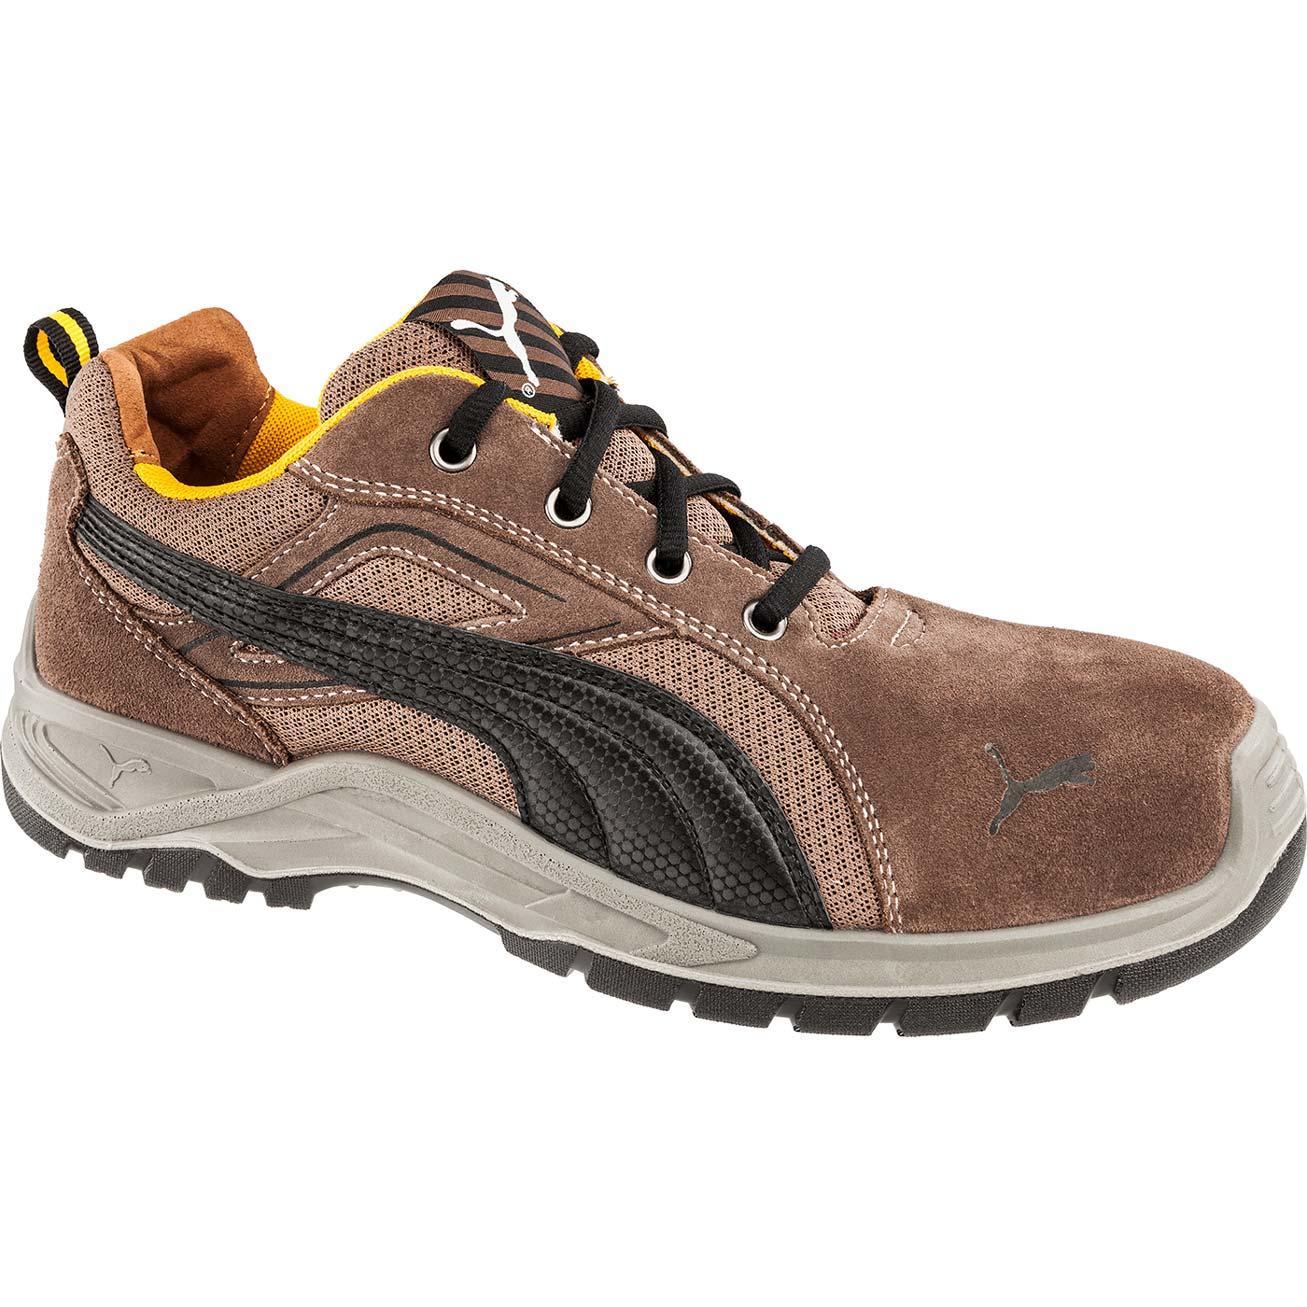 2488c2038b6464 puma steel toe on sale   OFF51% Discounts